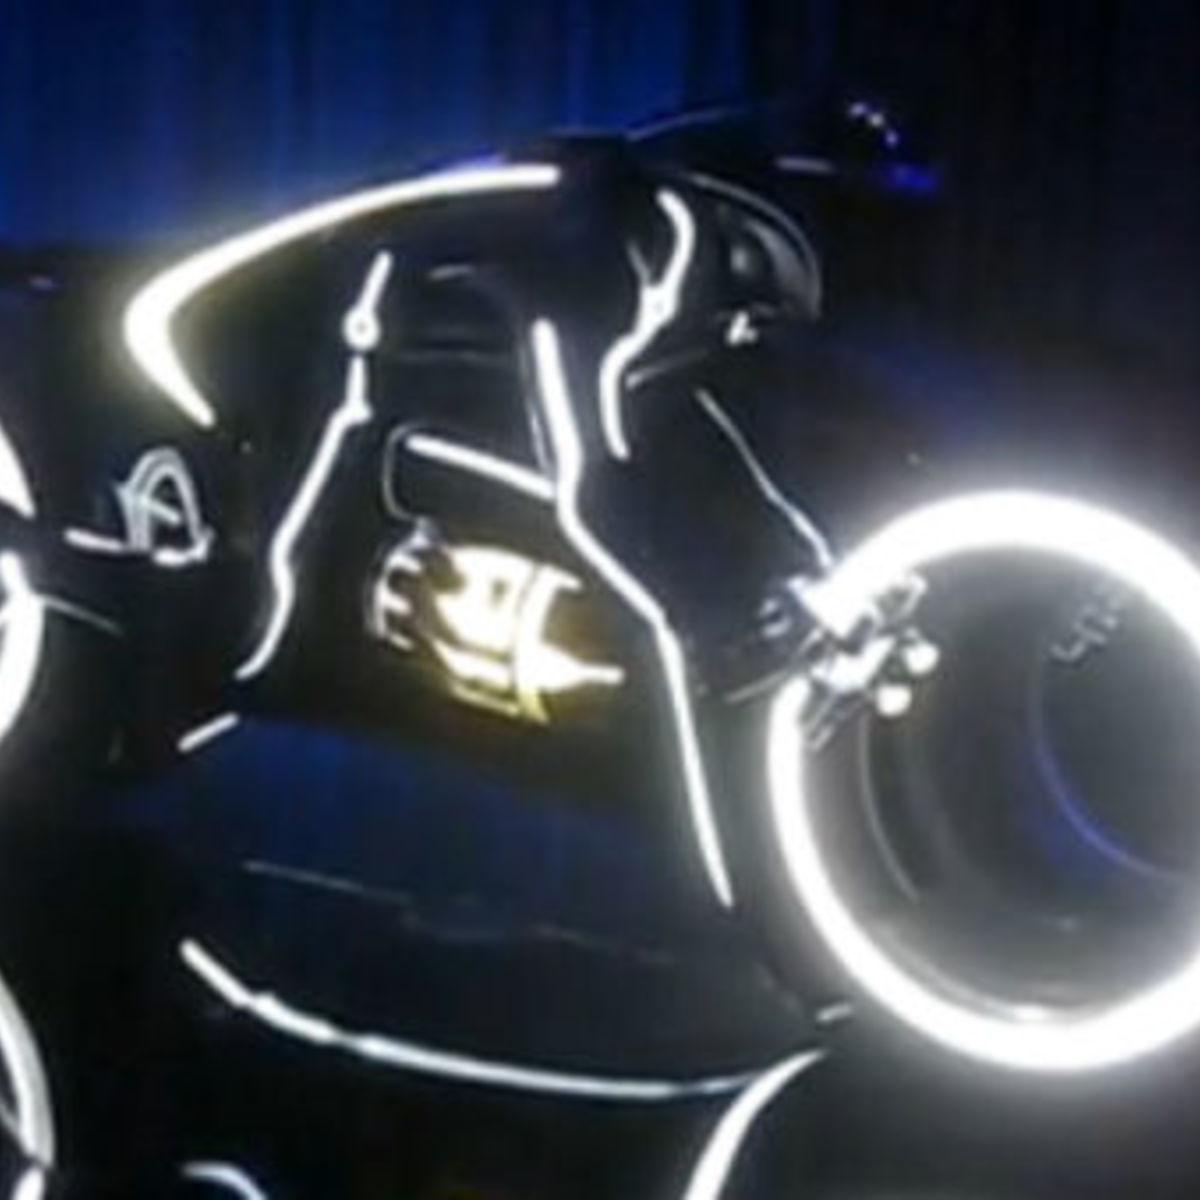 Tron_Legacy_lightcycle_comic_screencap.jpg